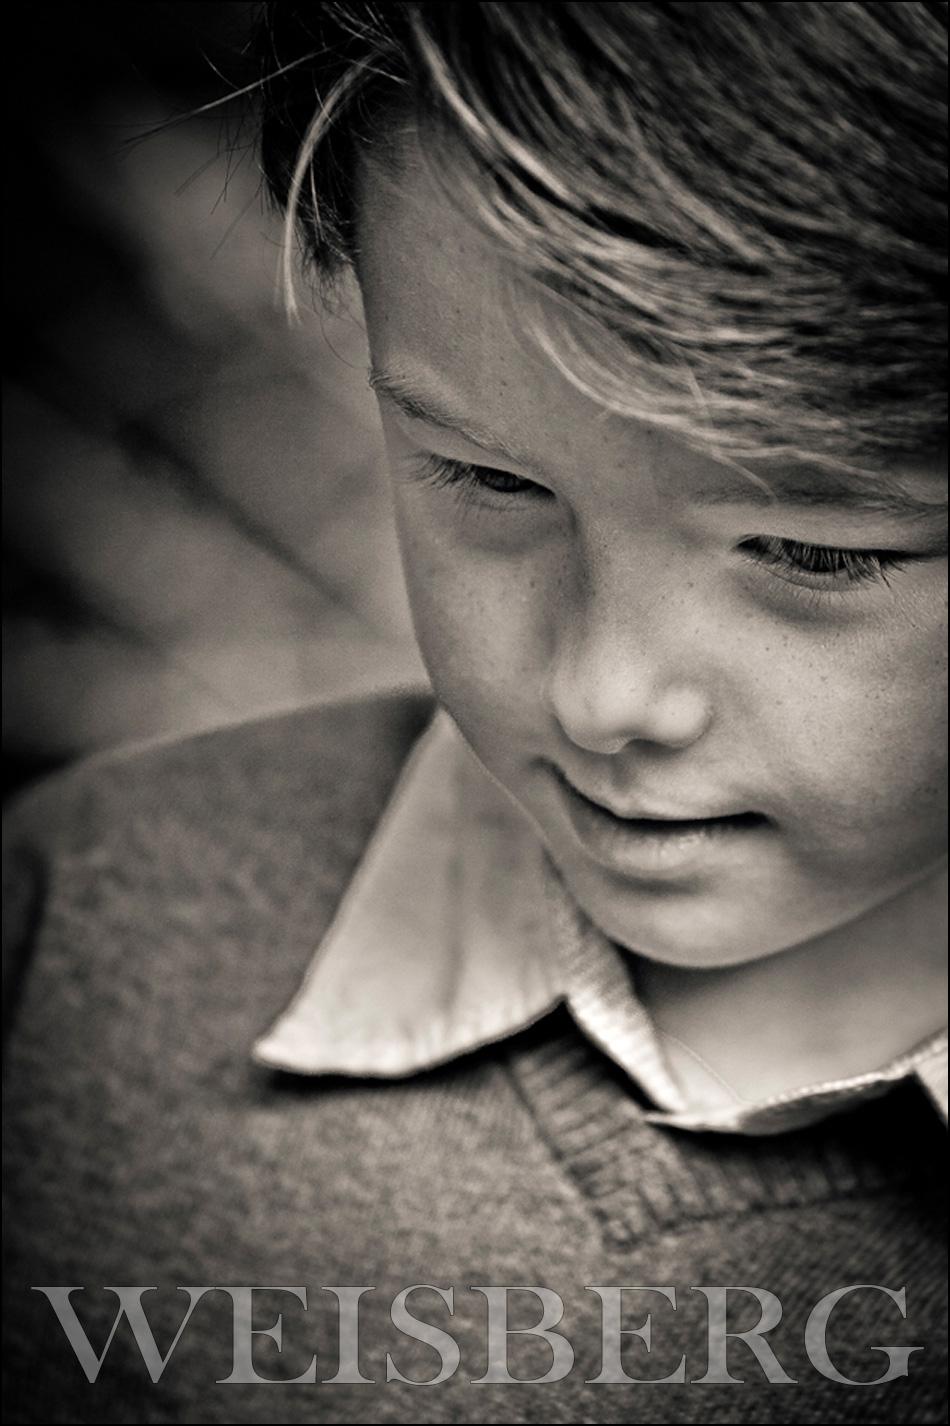 black & white portrait of a 6 year old boy